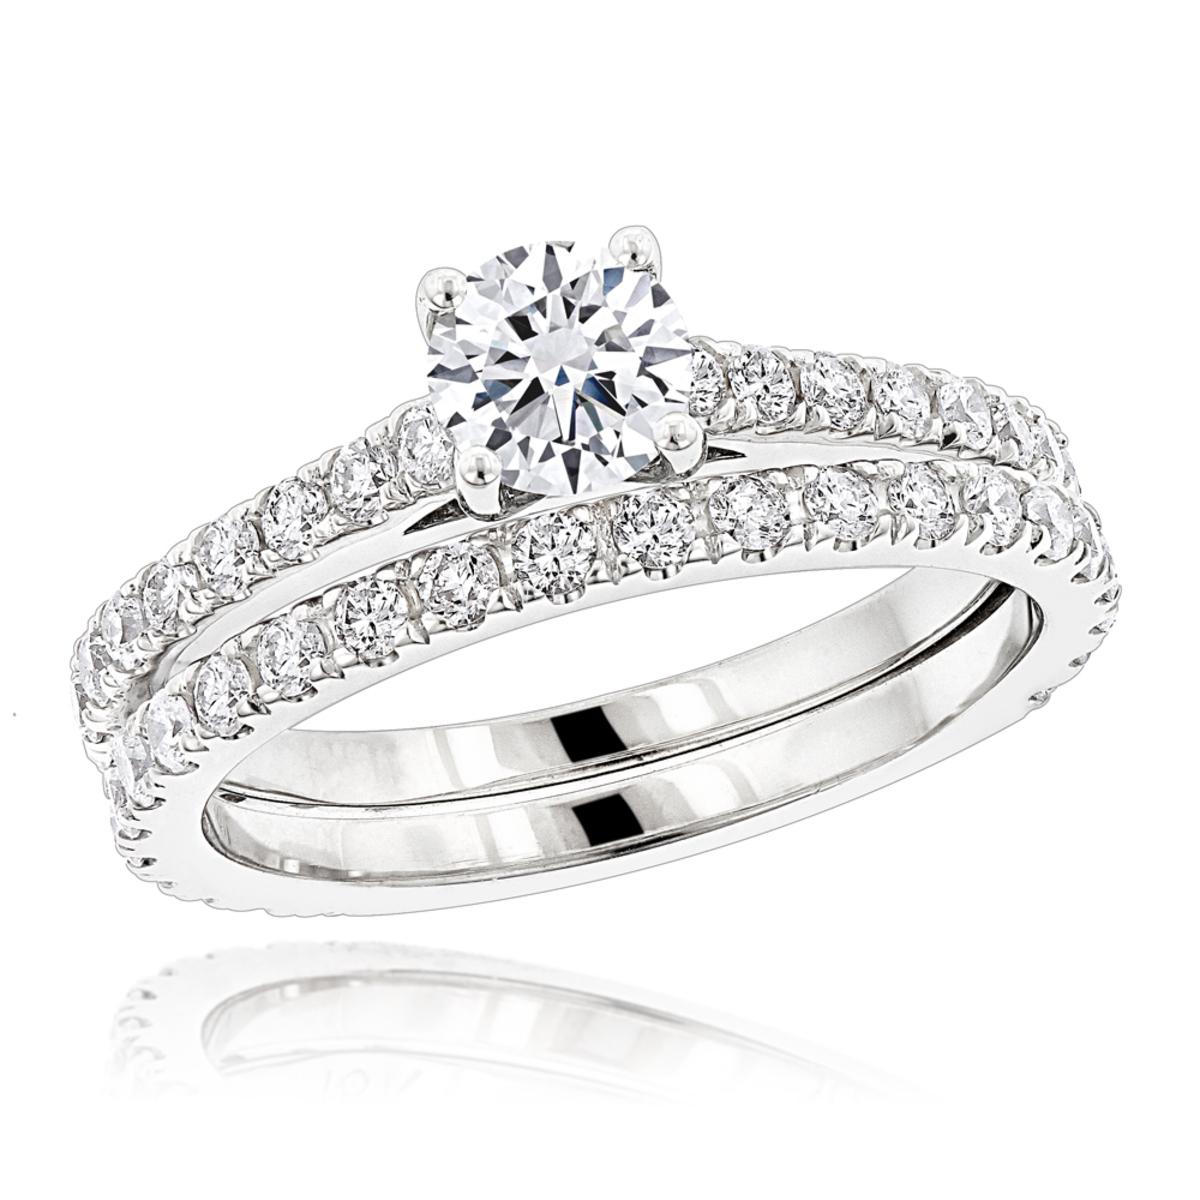 1.5 Carat Round Diamond Engagement Ring and Wedding Band Set in 18k Gold